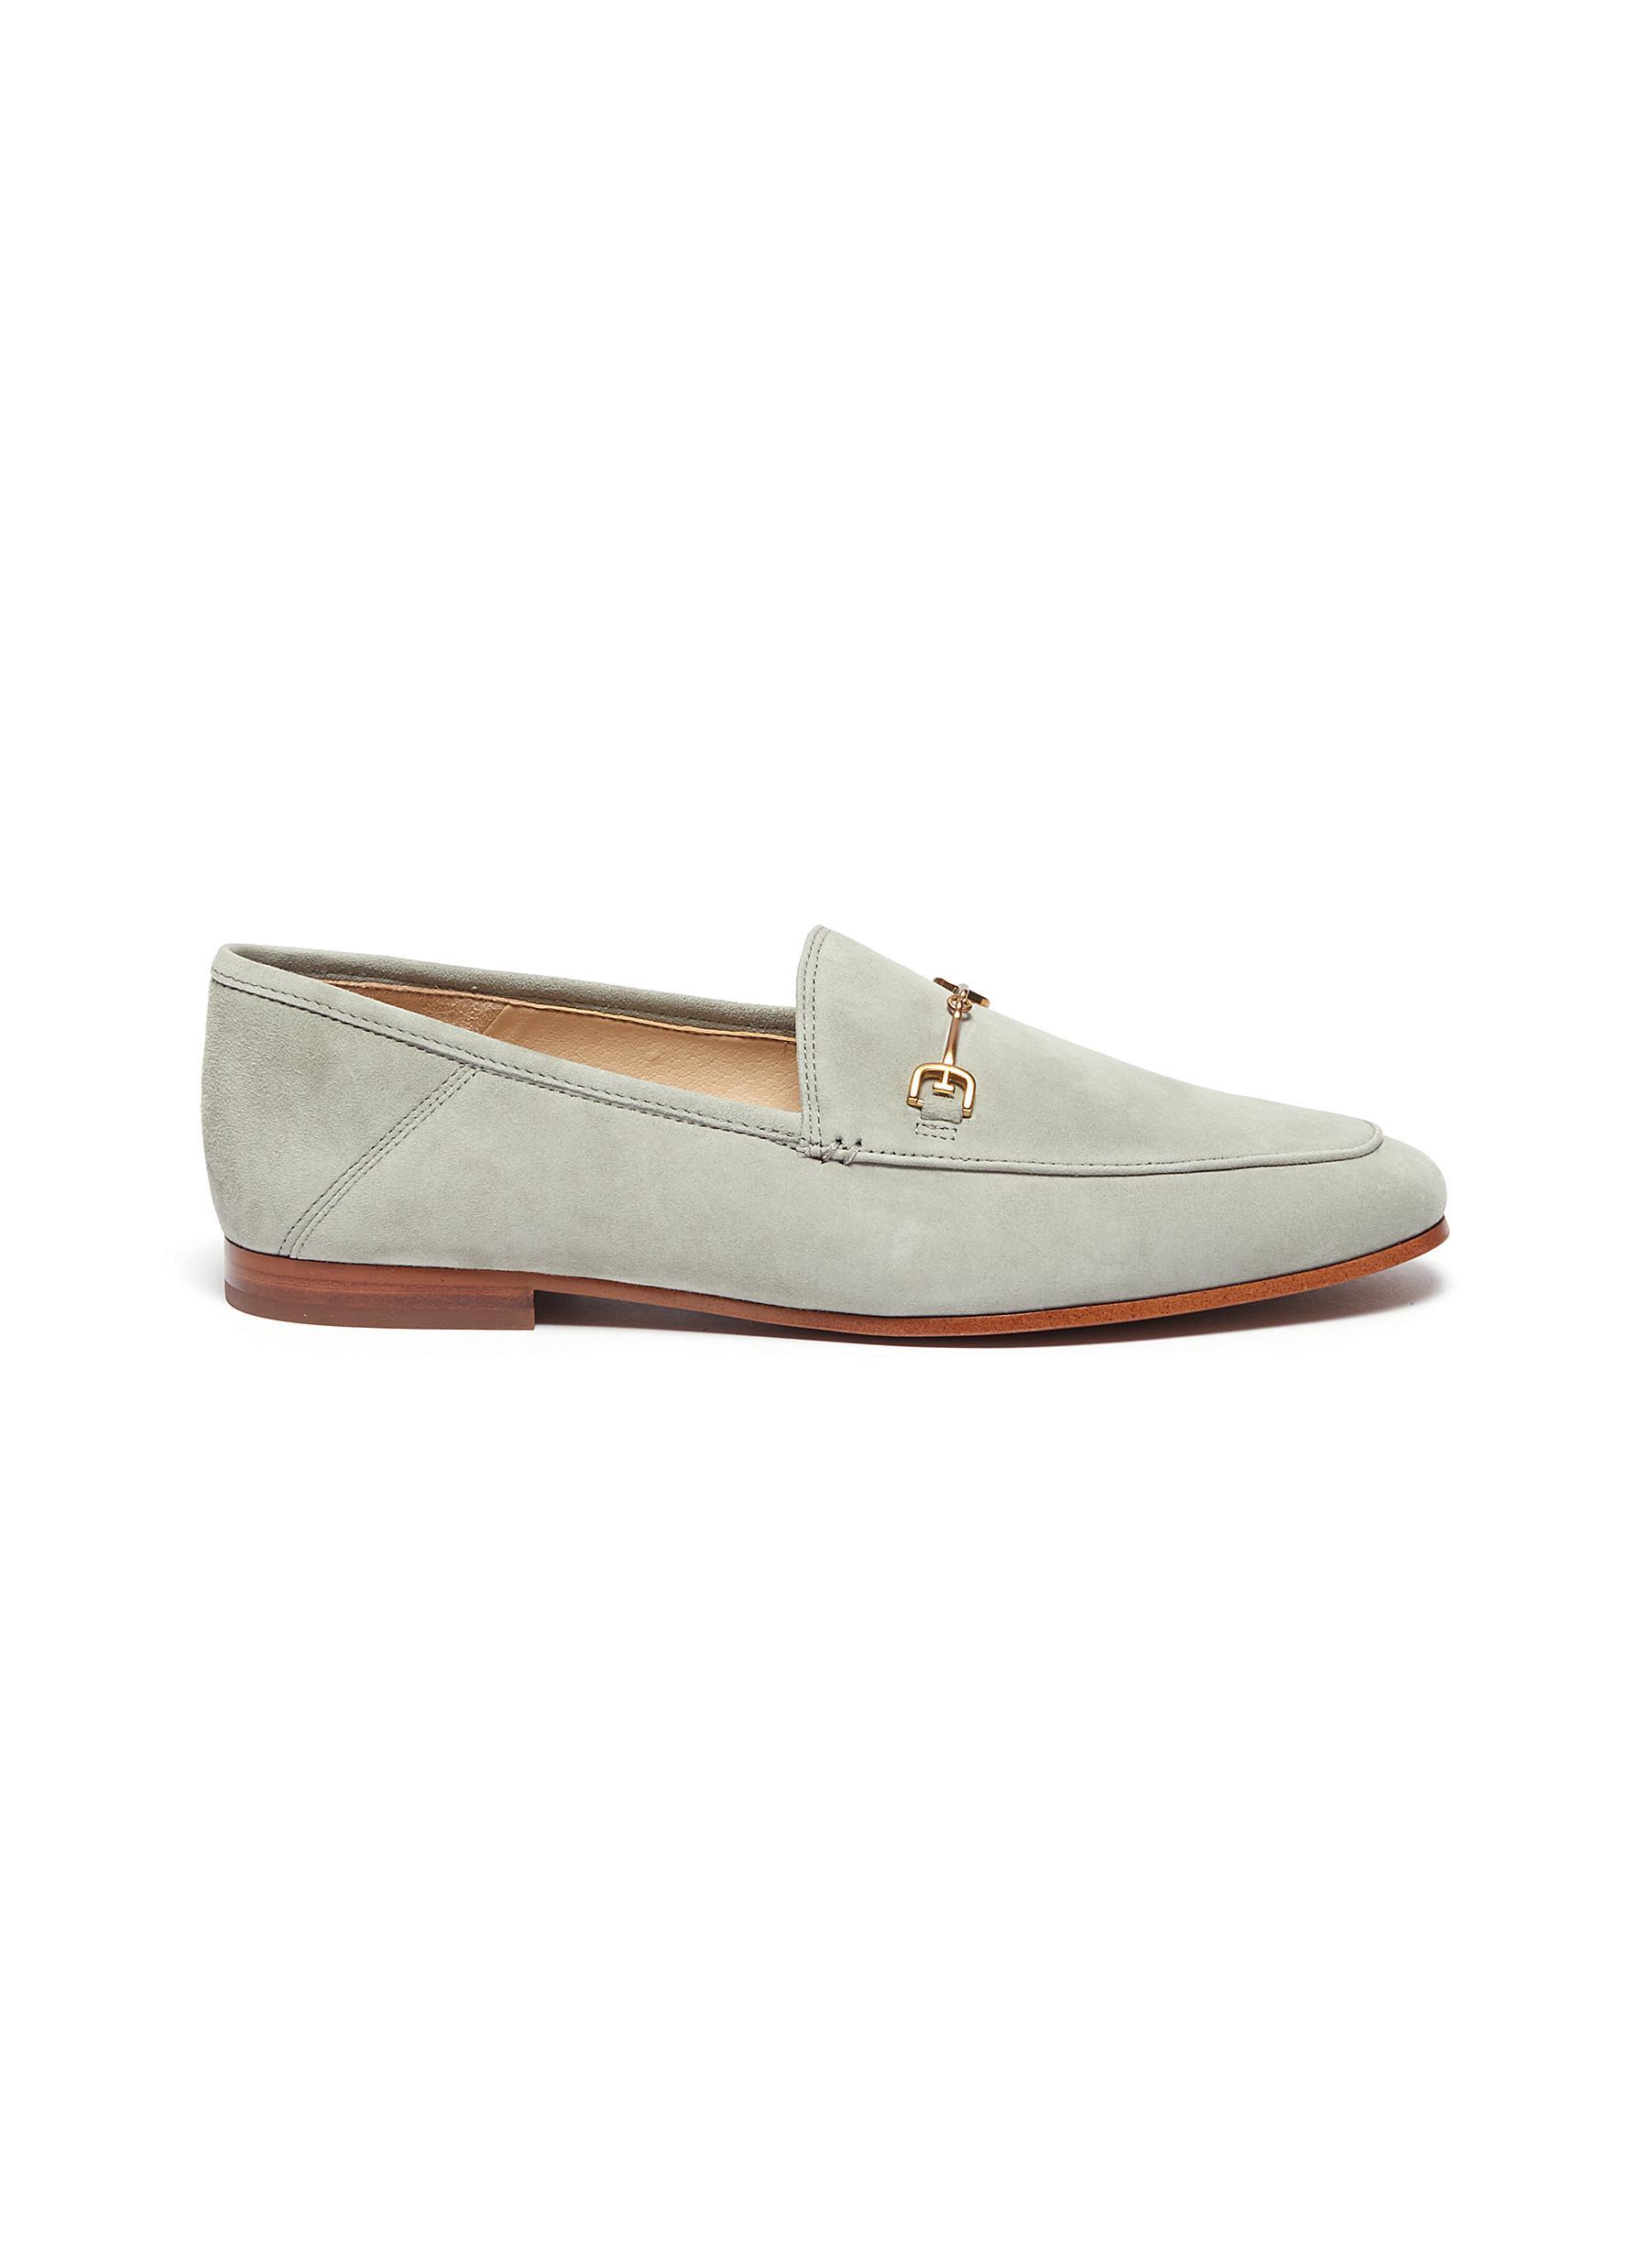 shop Sam Edelman 'Loraine' horsebit suede step-in loafers' online